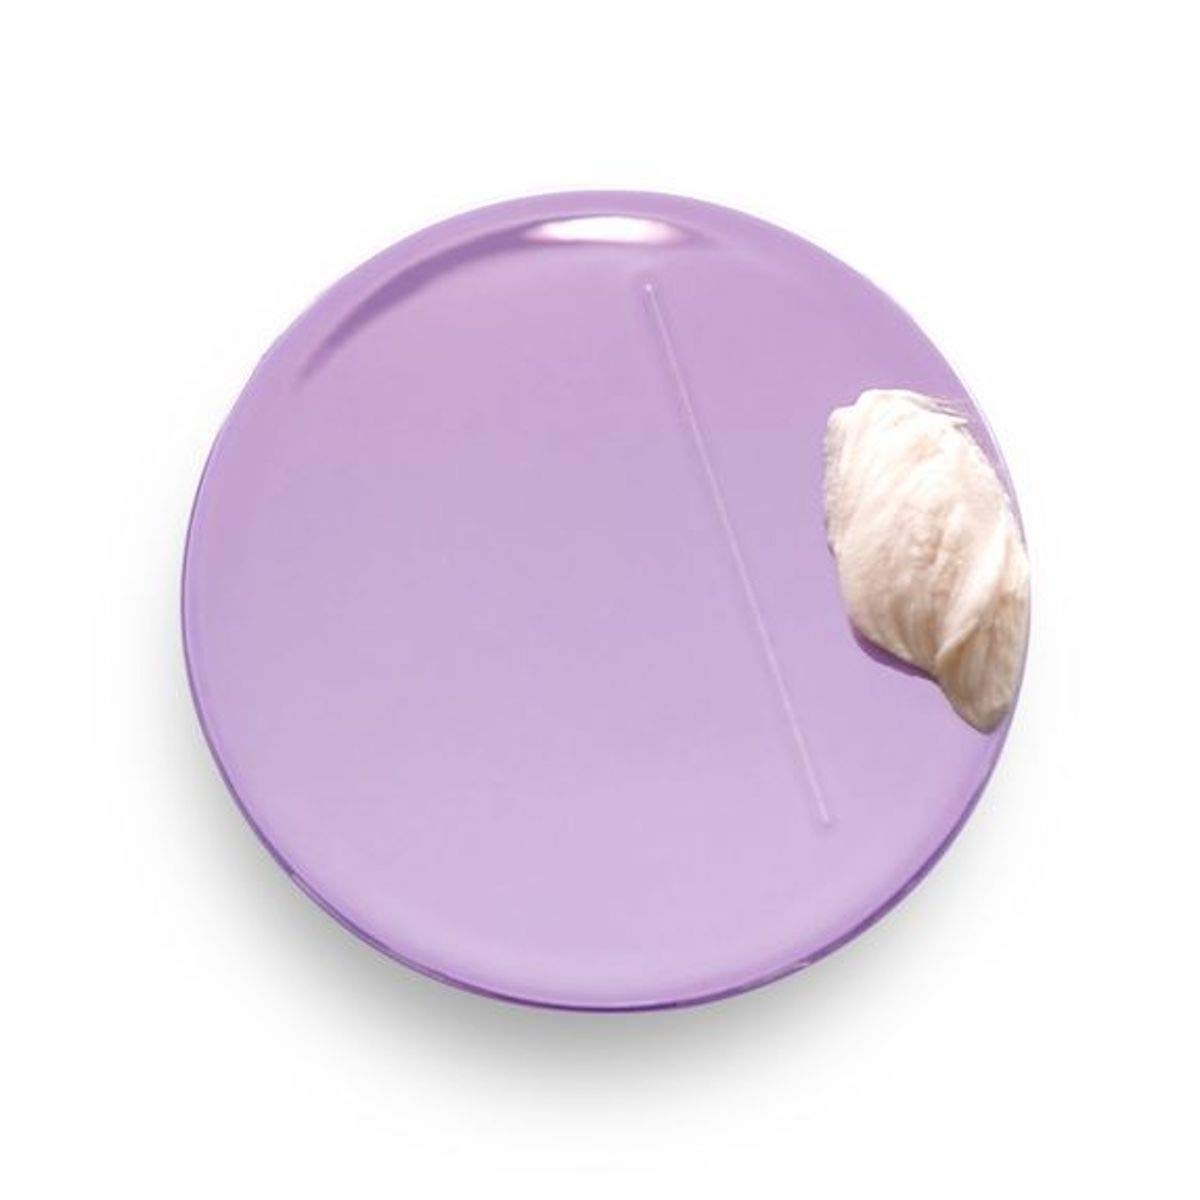 Tatcha The Silk Canvas - 20 grams / 0.7 ounces by TATCHA